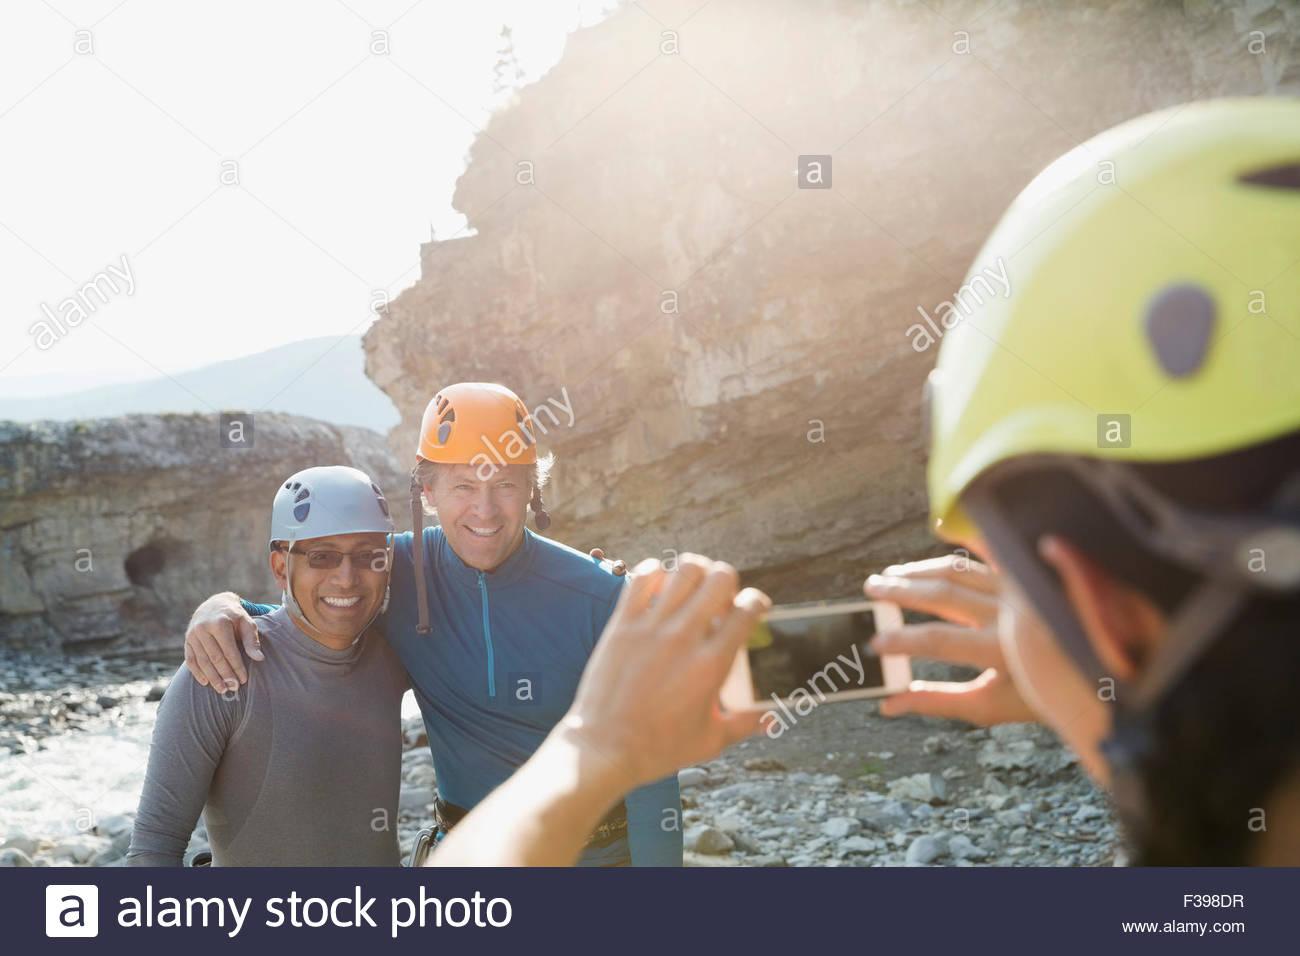 Woman photographing men rock climber helmets - Stock Image